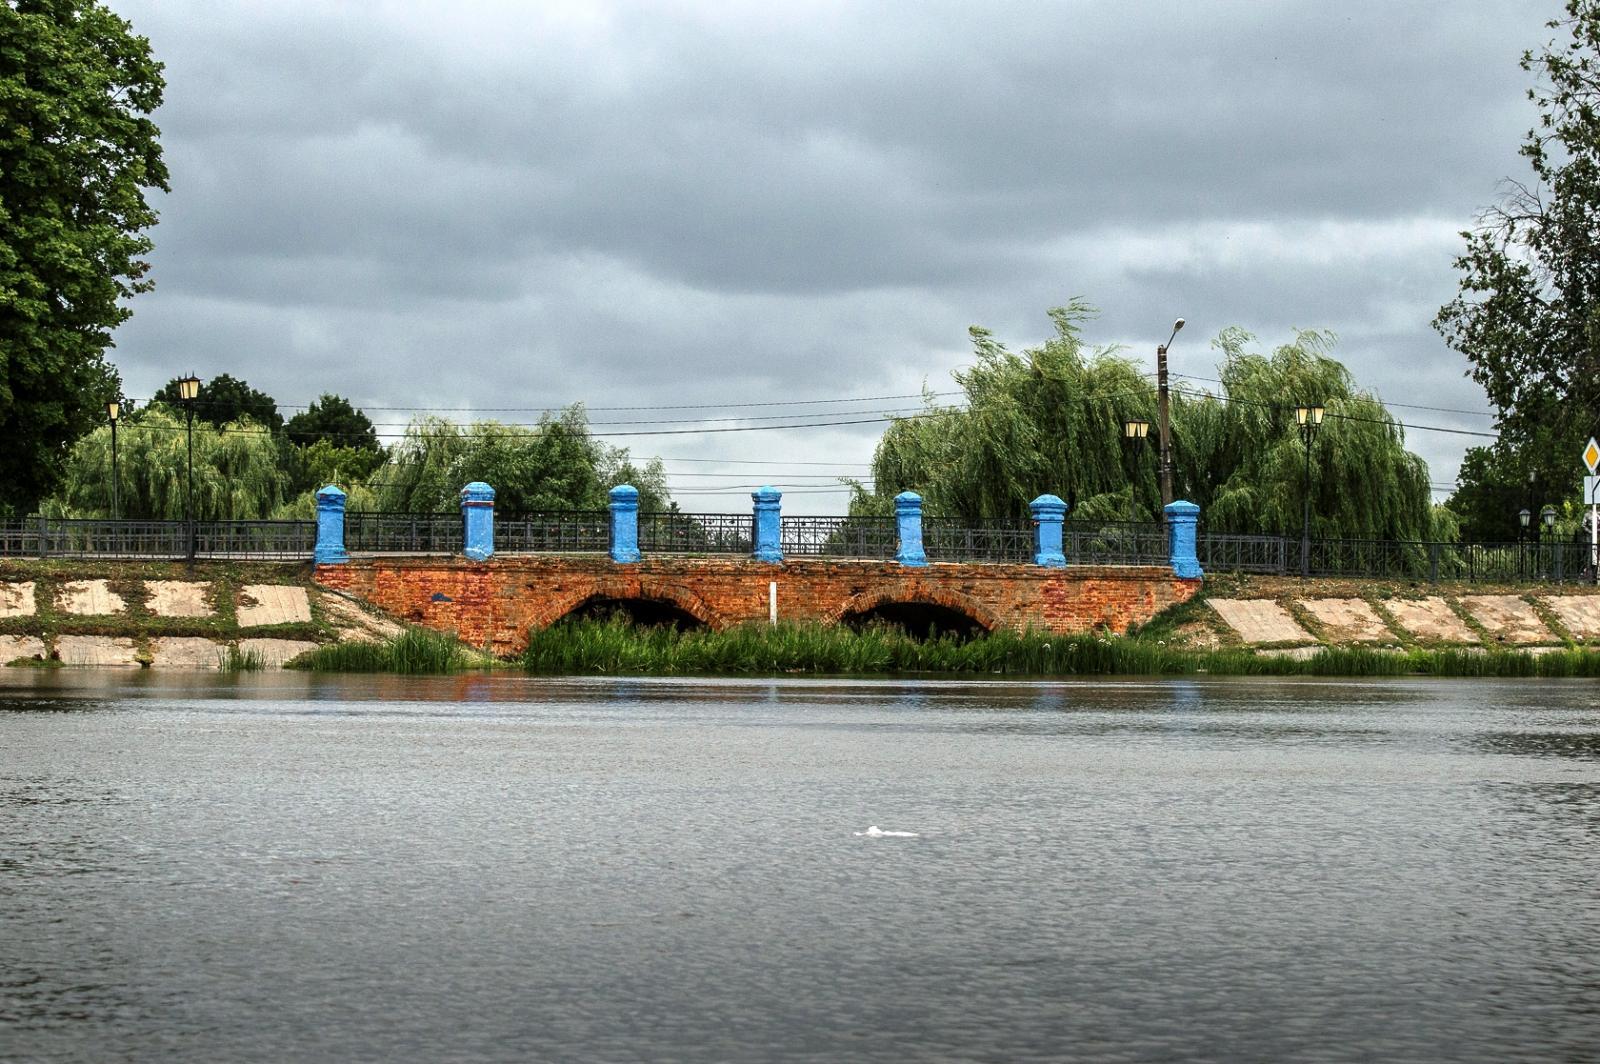 В Новозыбкове Брянской области на озере Карна утонул 46-летний мужчина